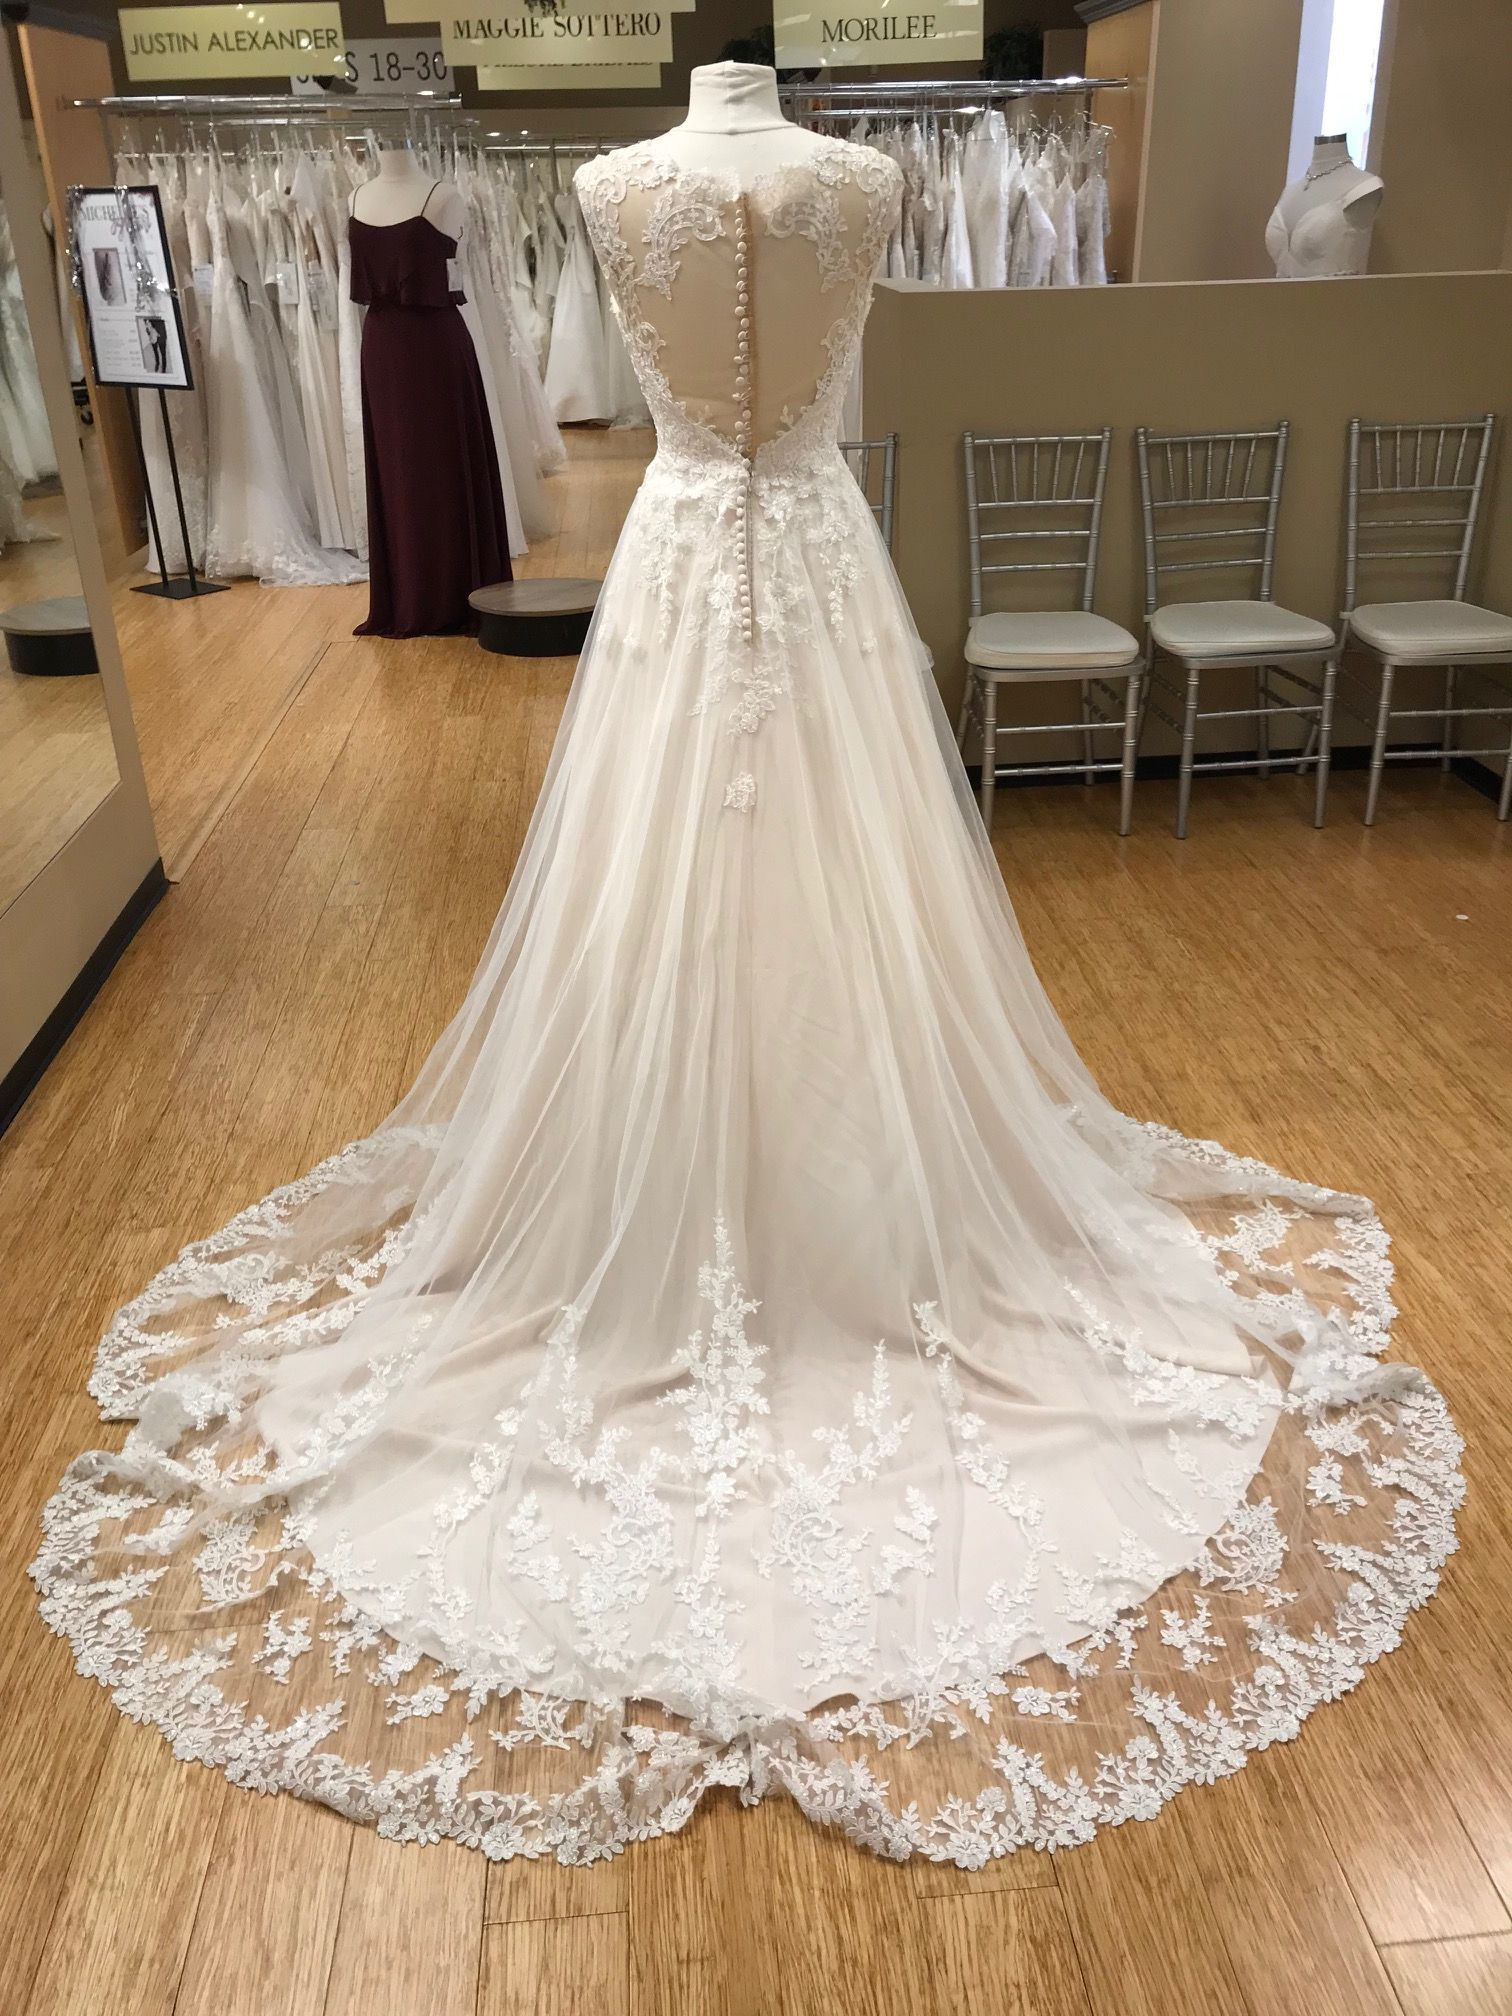 Home wedding pinterest wedding dresses wedding and wedding gowns